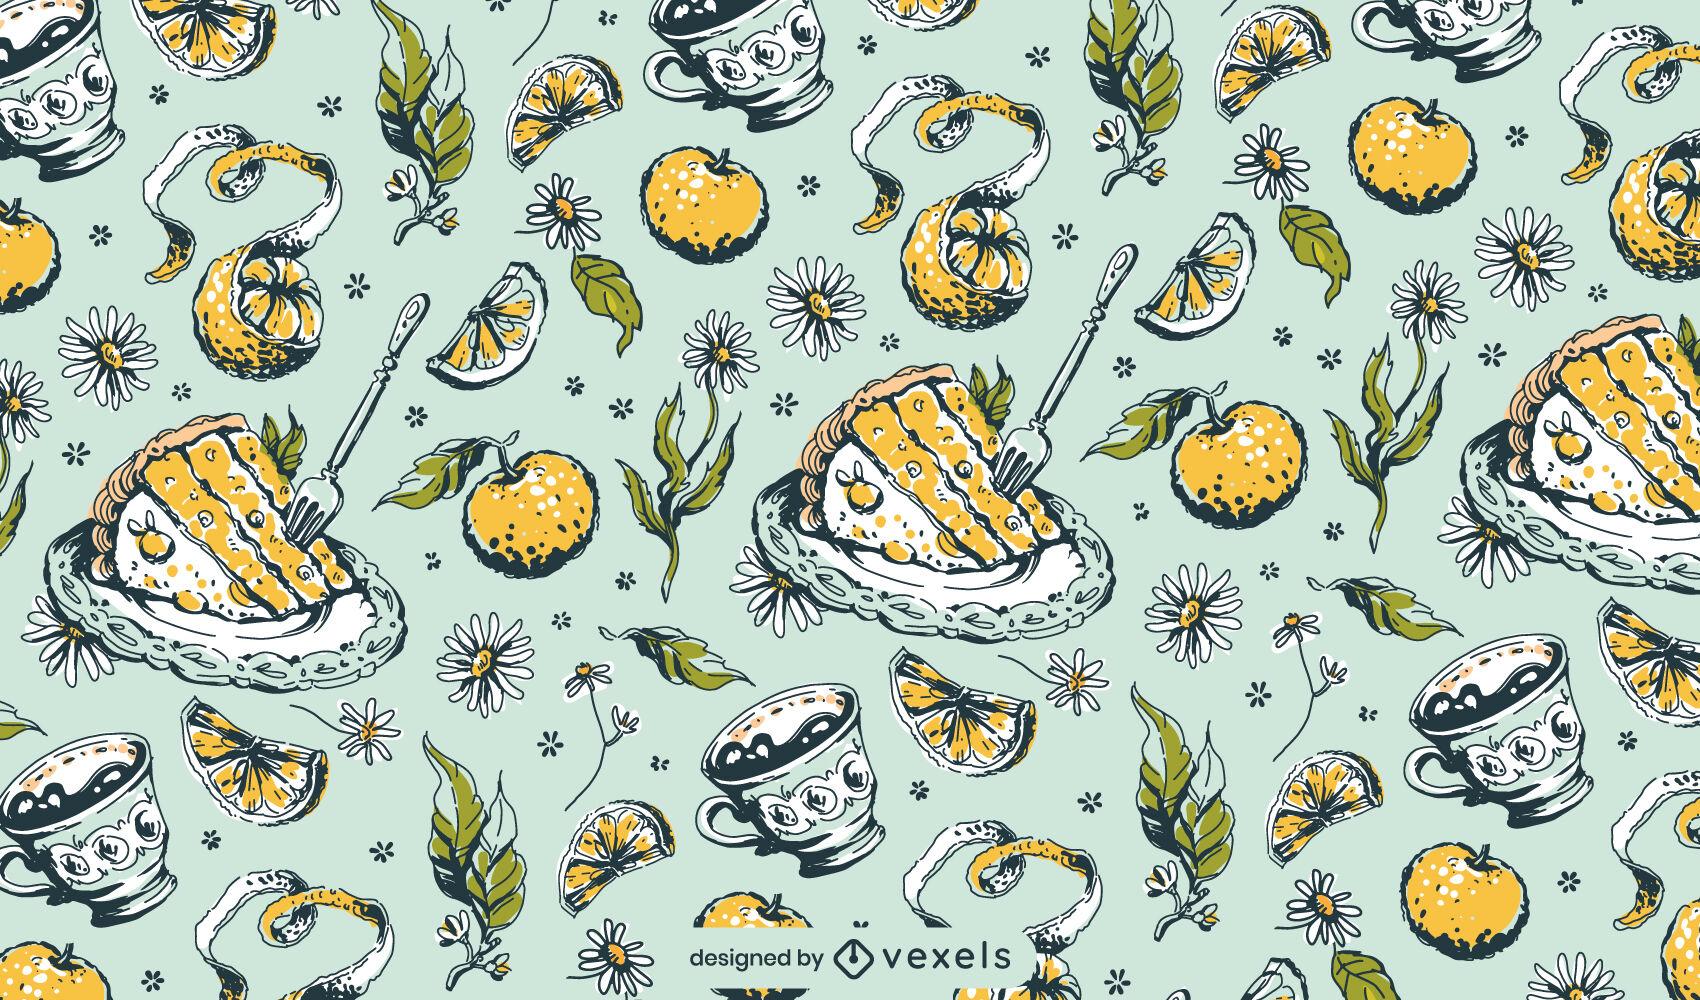 Süßes Essen Teezeit Vintage-Muster-Design